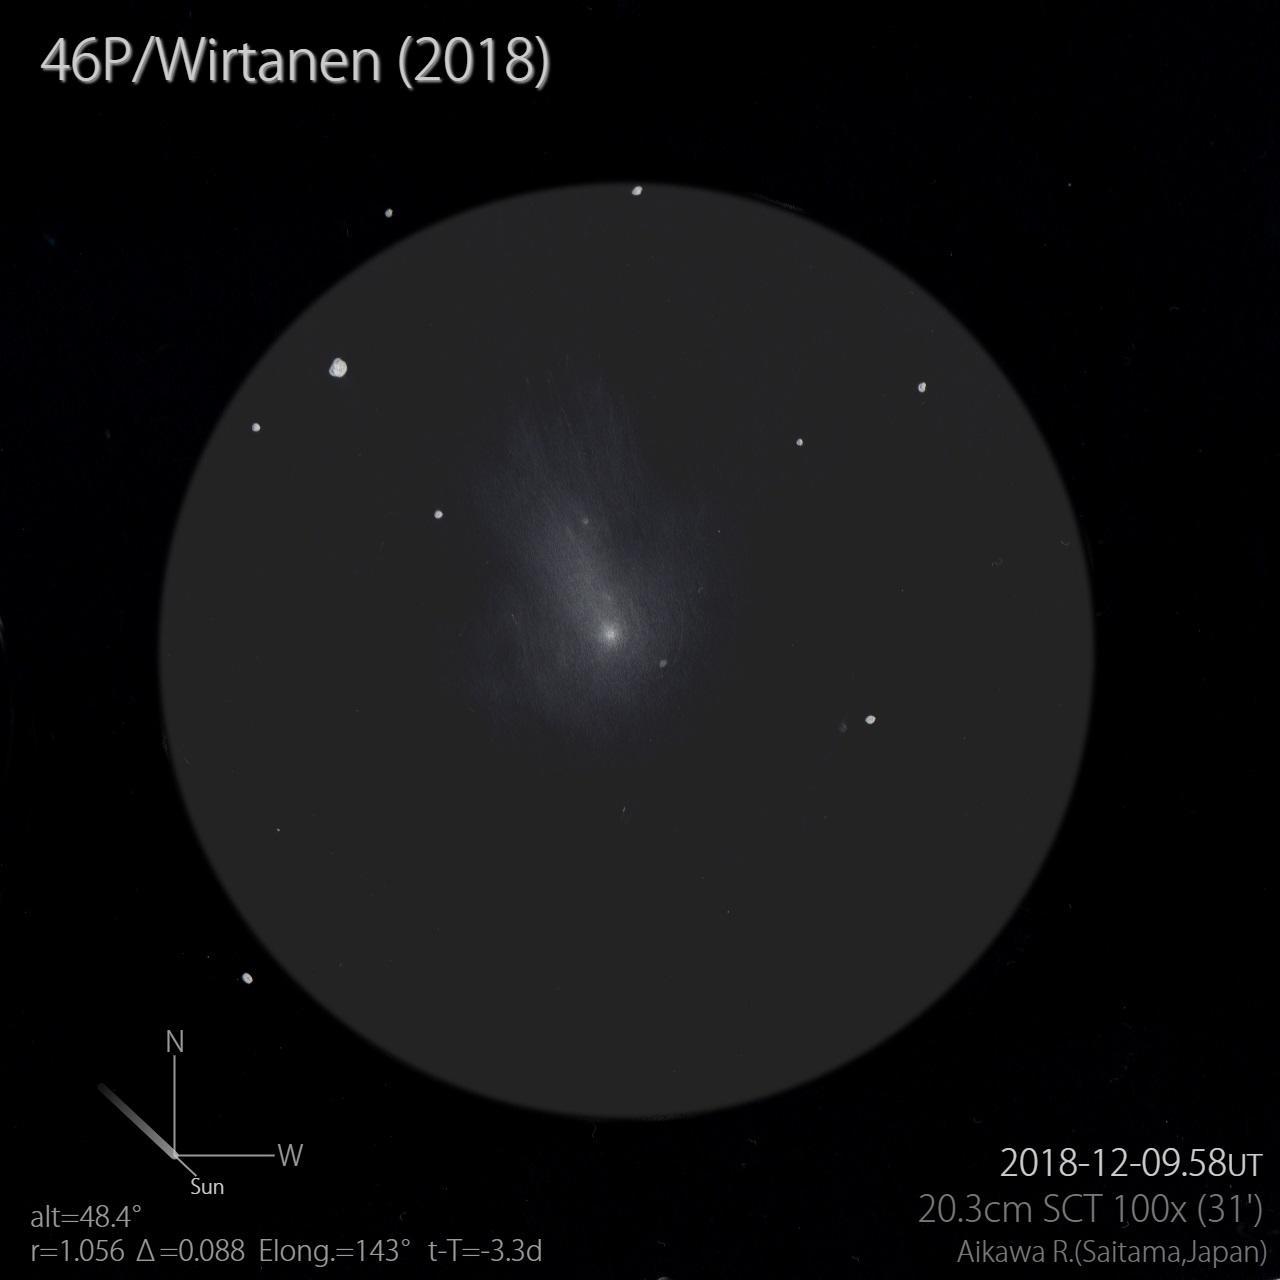 0046P-2018_004-editPosi-35-0.95.jpg